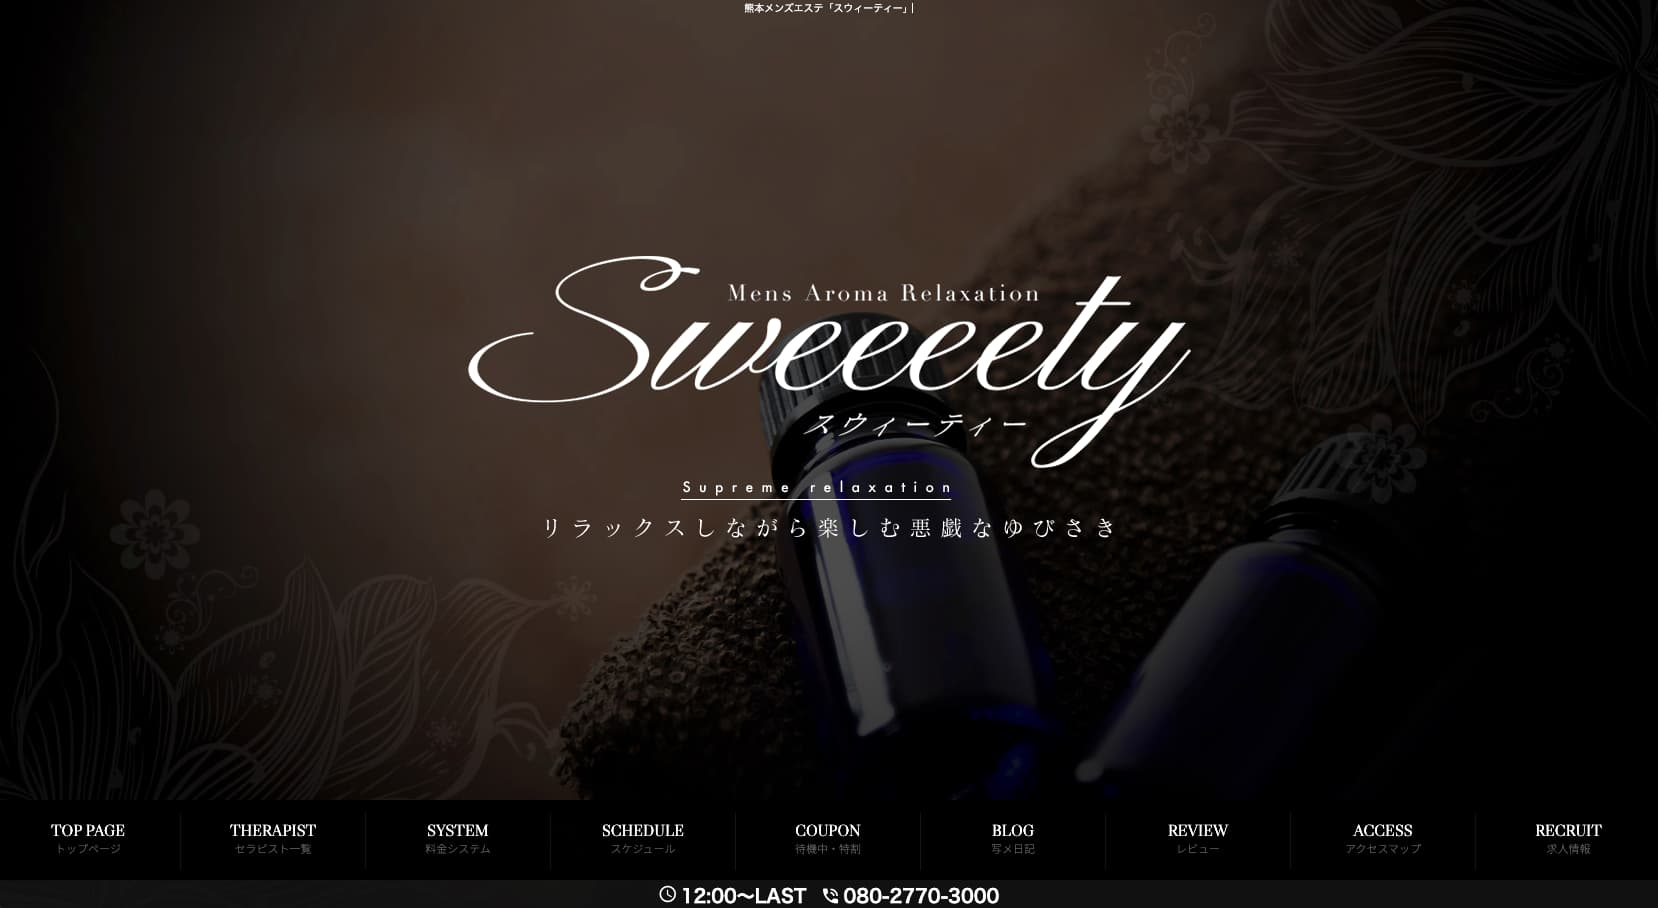 Sweeeety(スウィーティー)